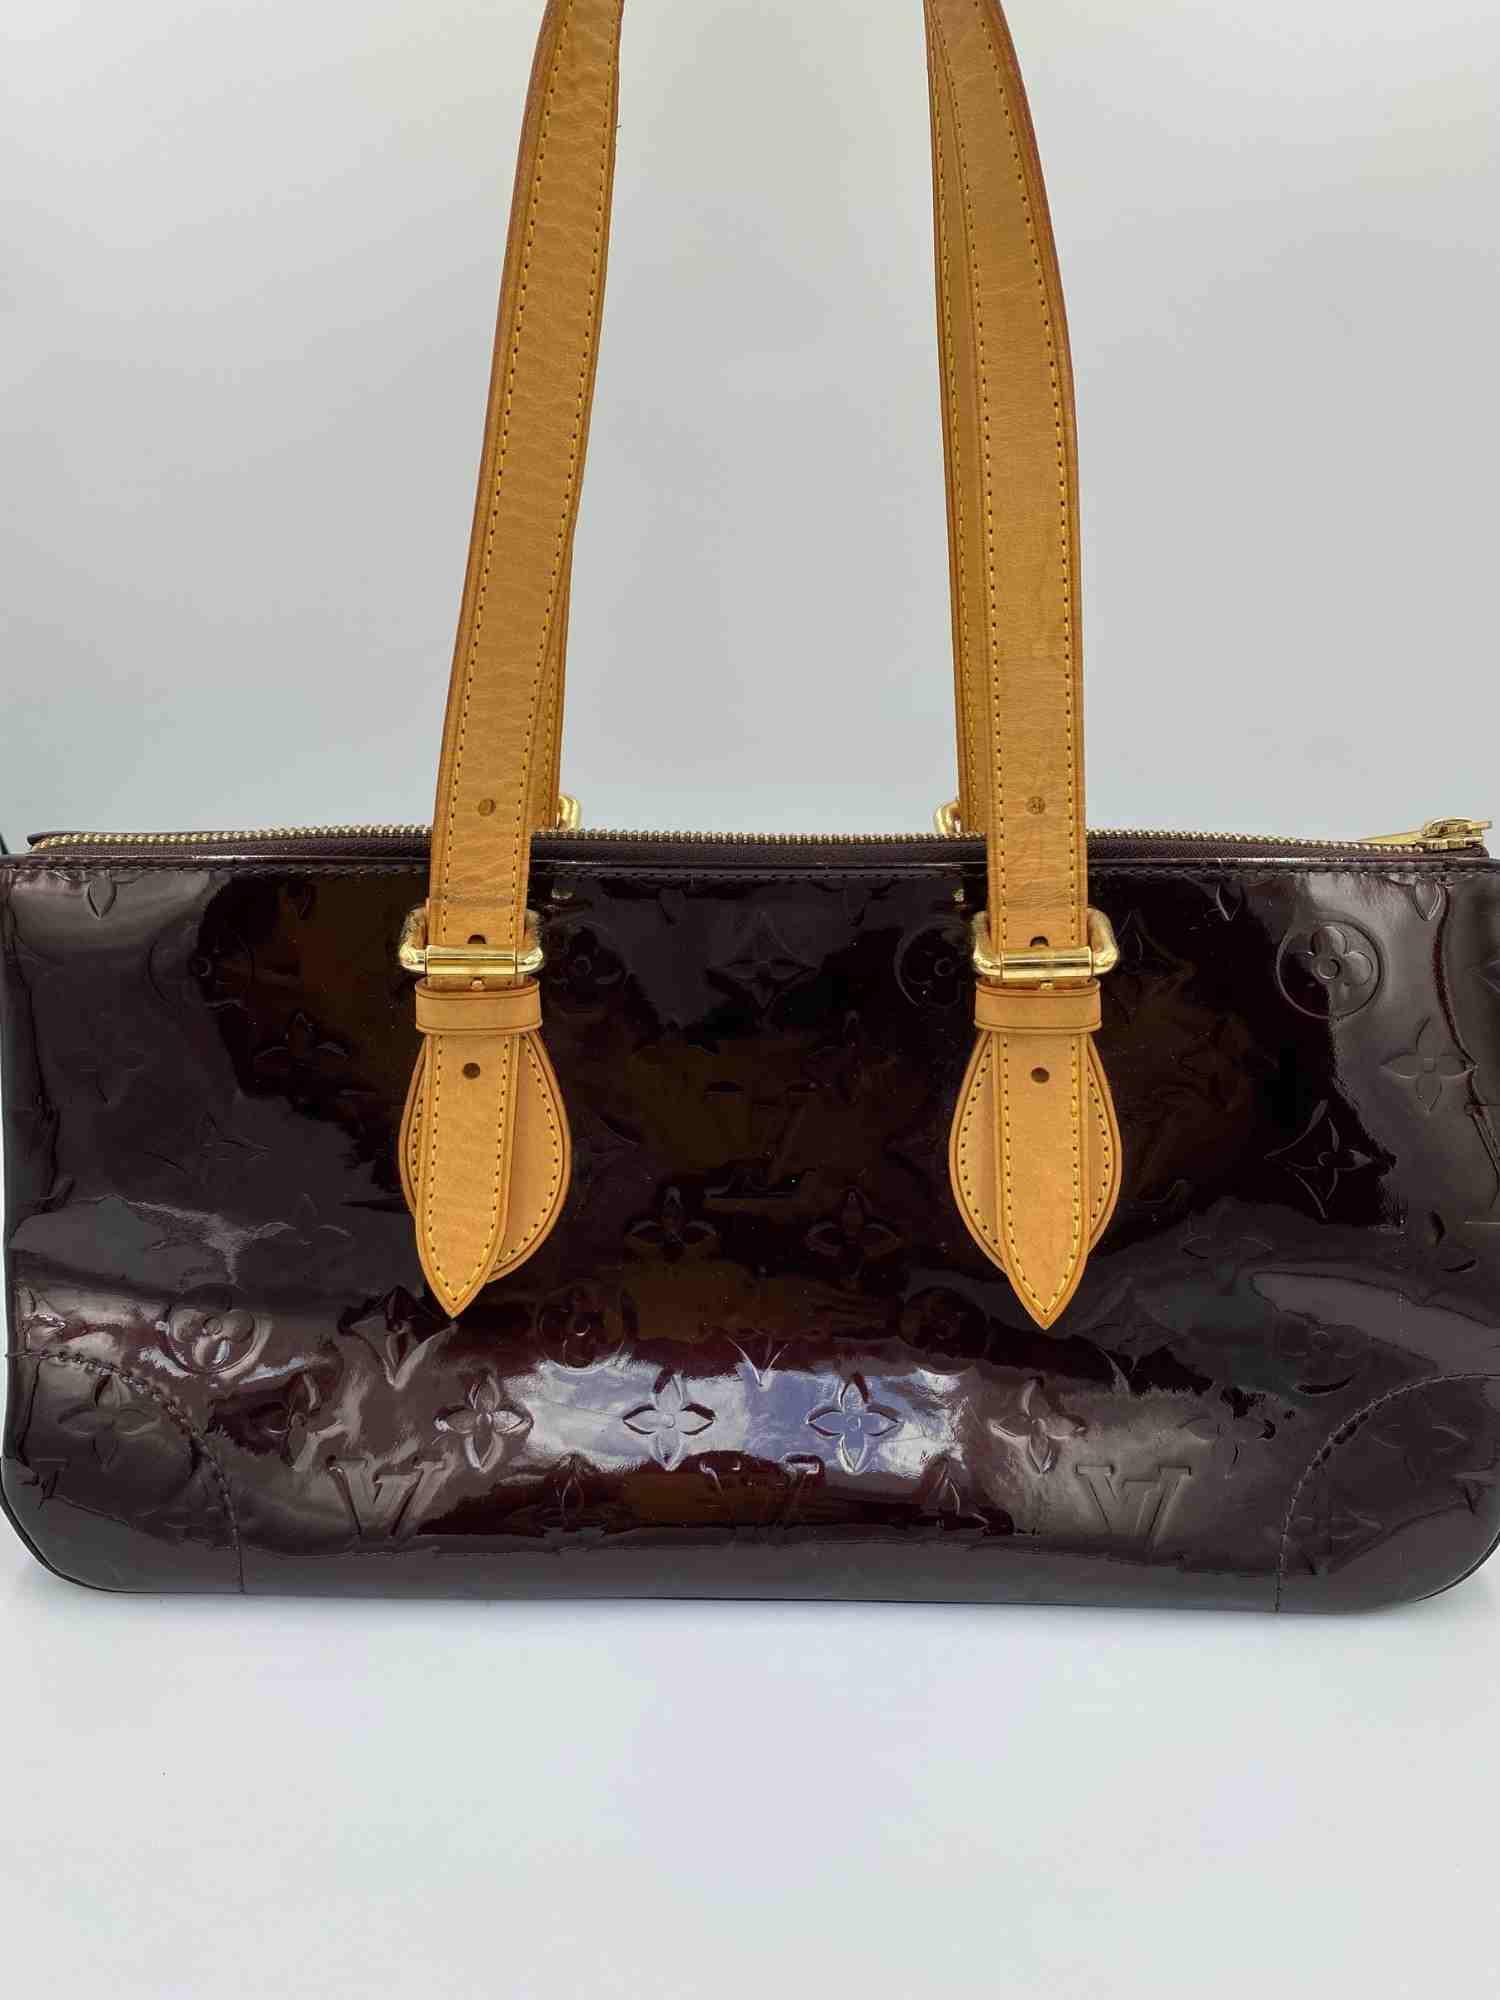 Bolsa Louis Vuitton Rosewood Monograma Verniz